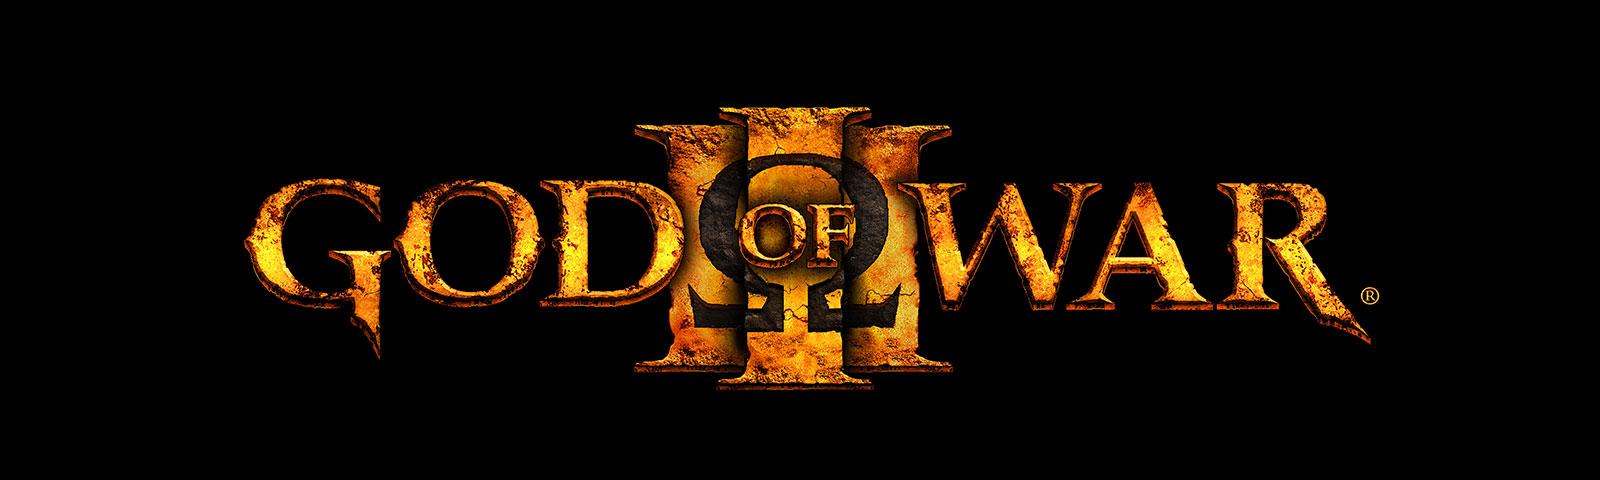 god-of-war-logo_big